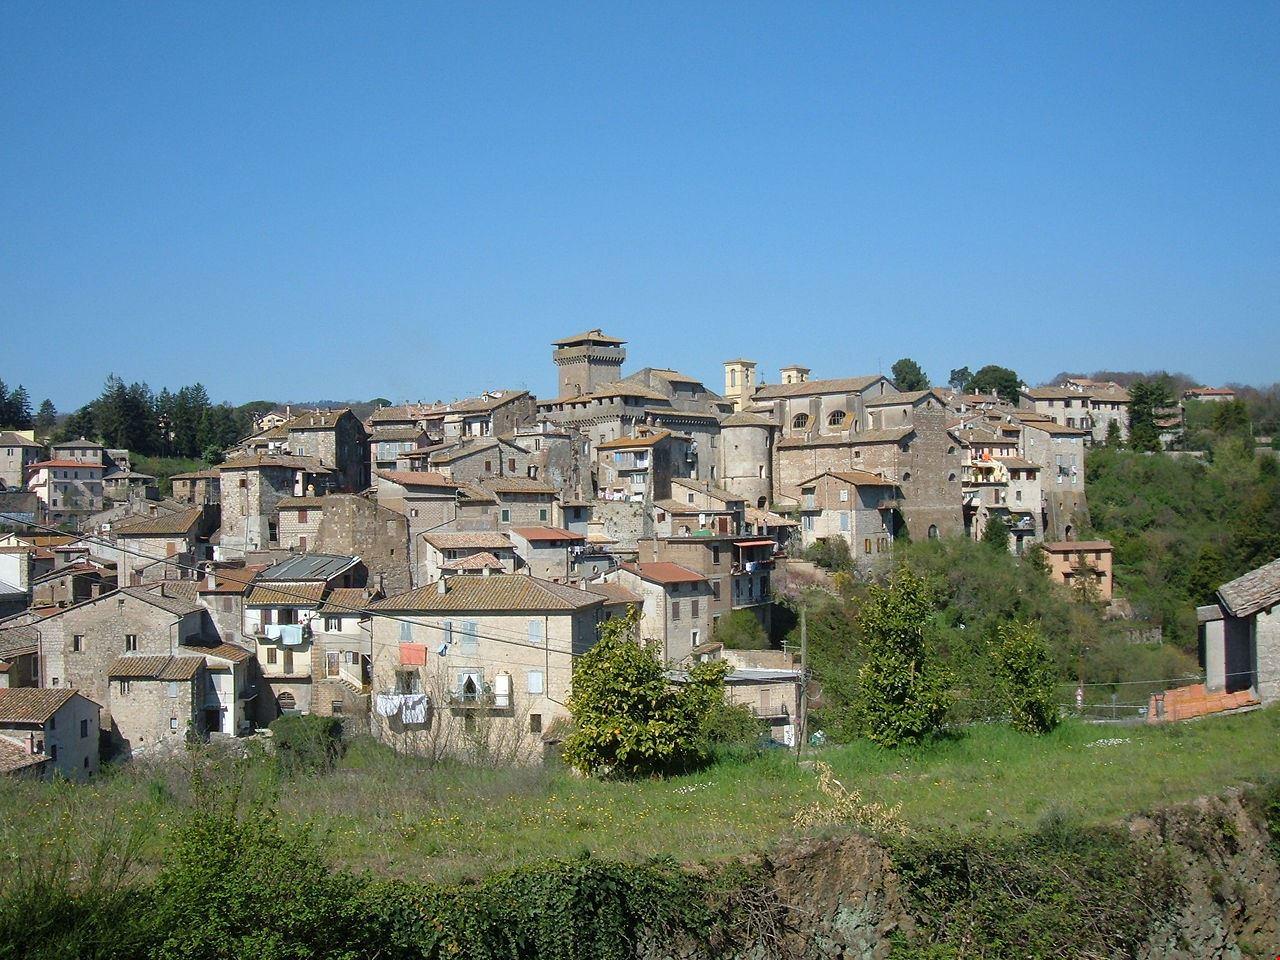 1280px-Carbognano_-_Panorama_7